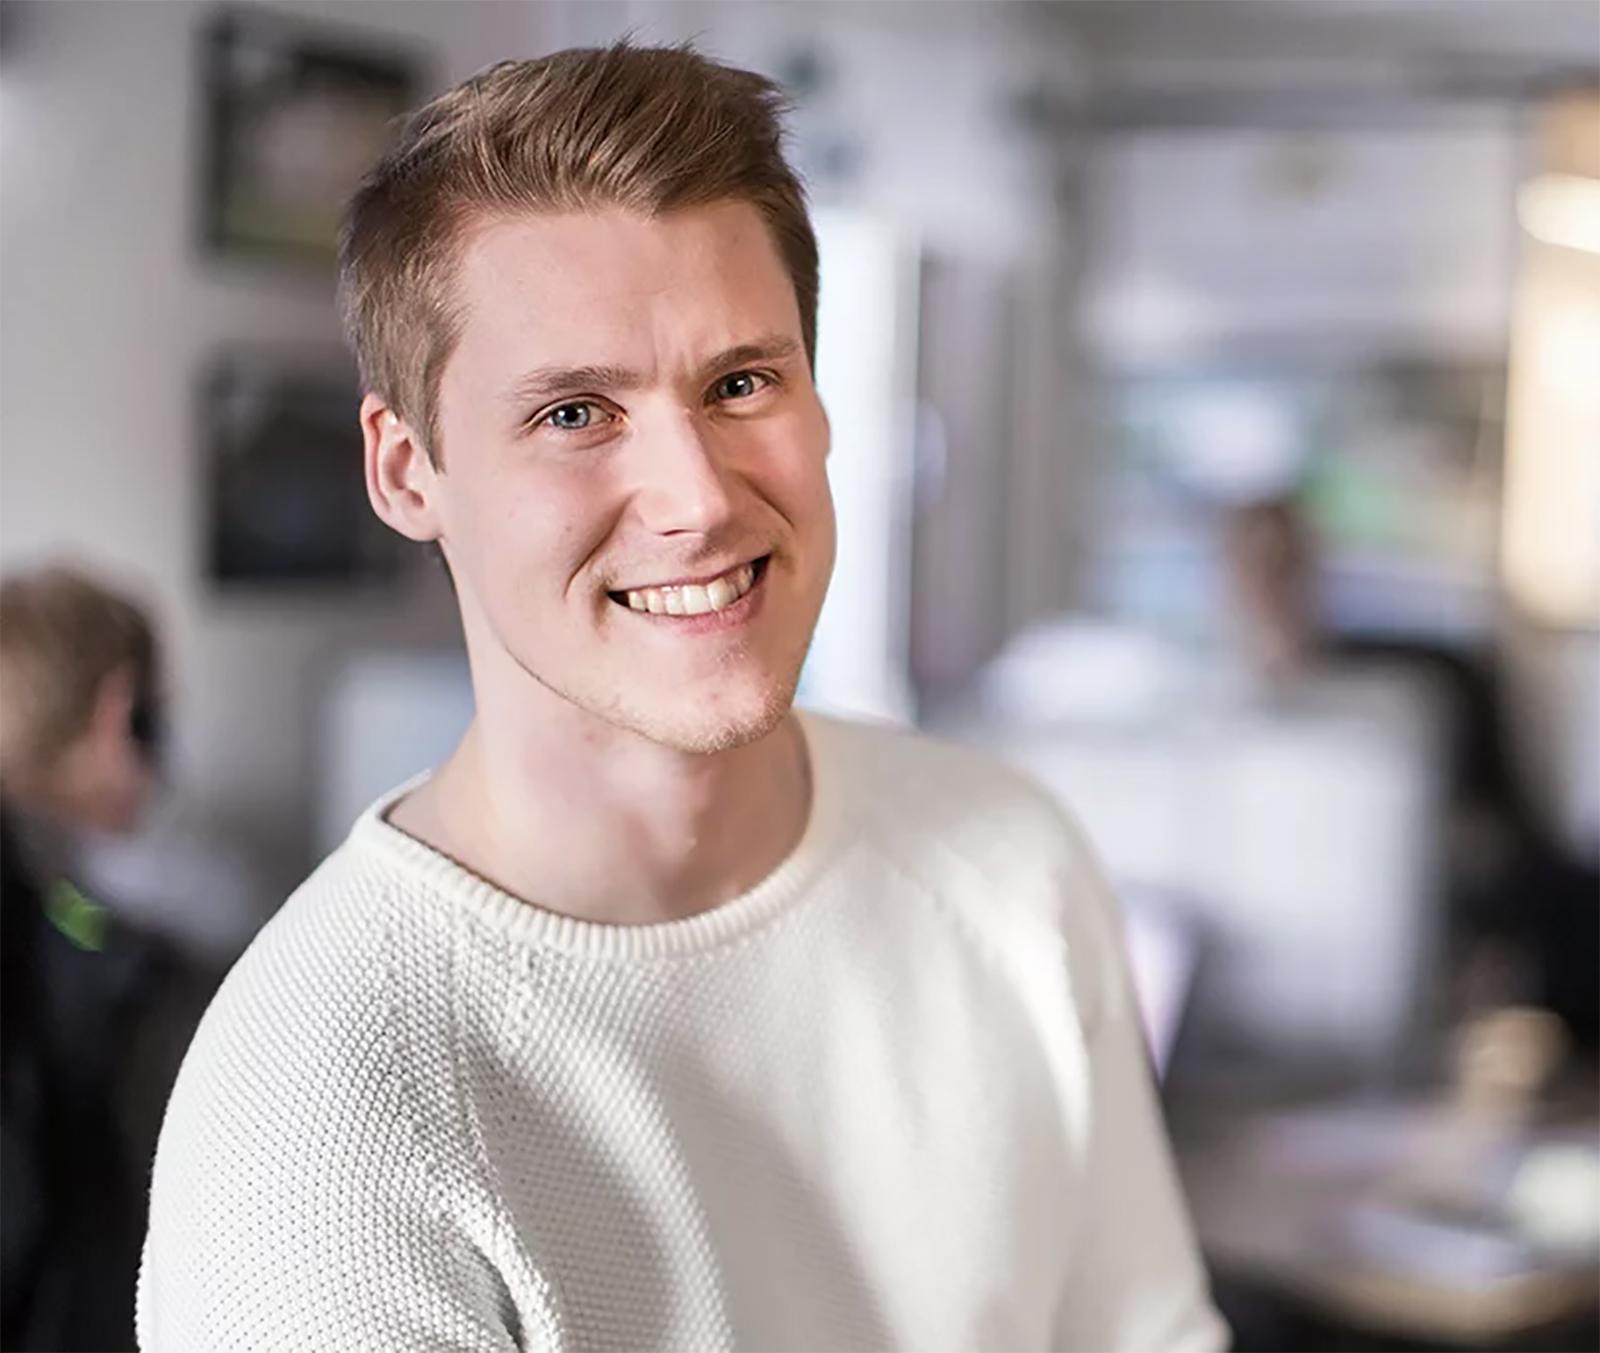 Samuel Holmstrom Lundkvist Trä